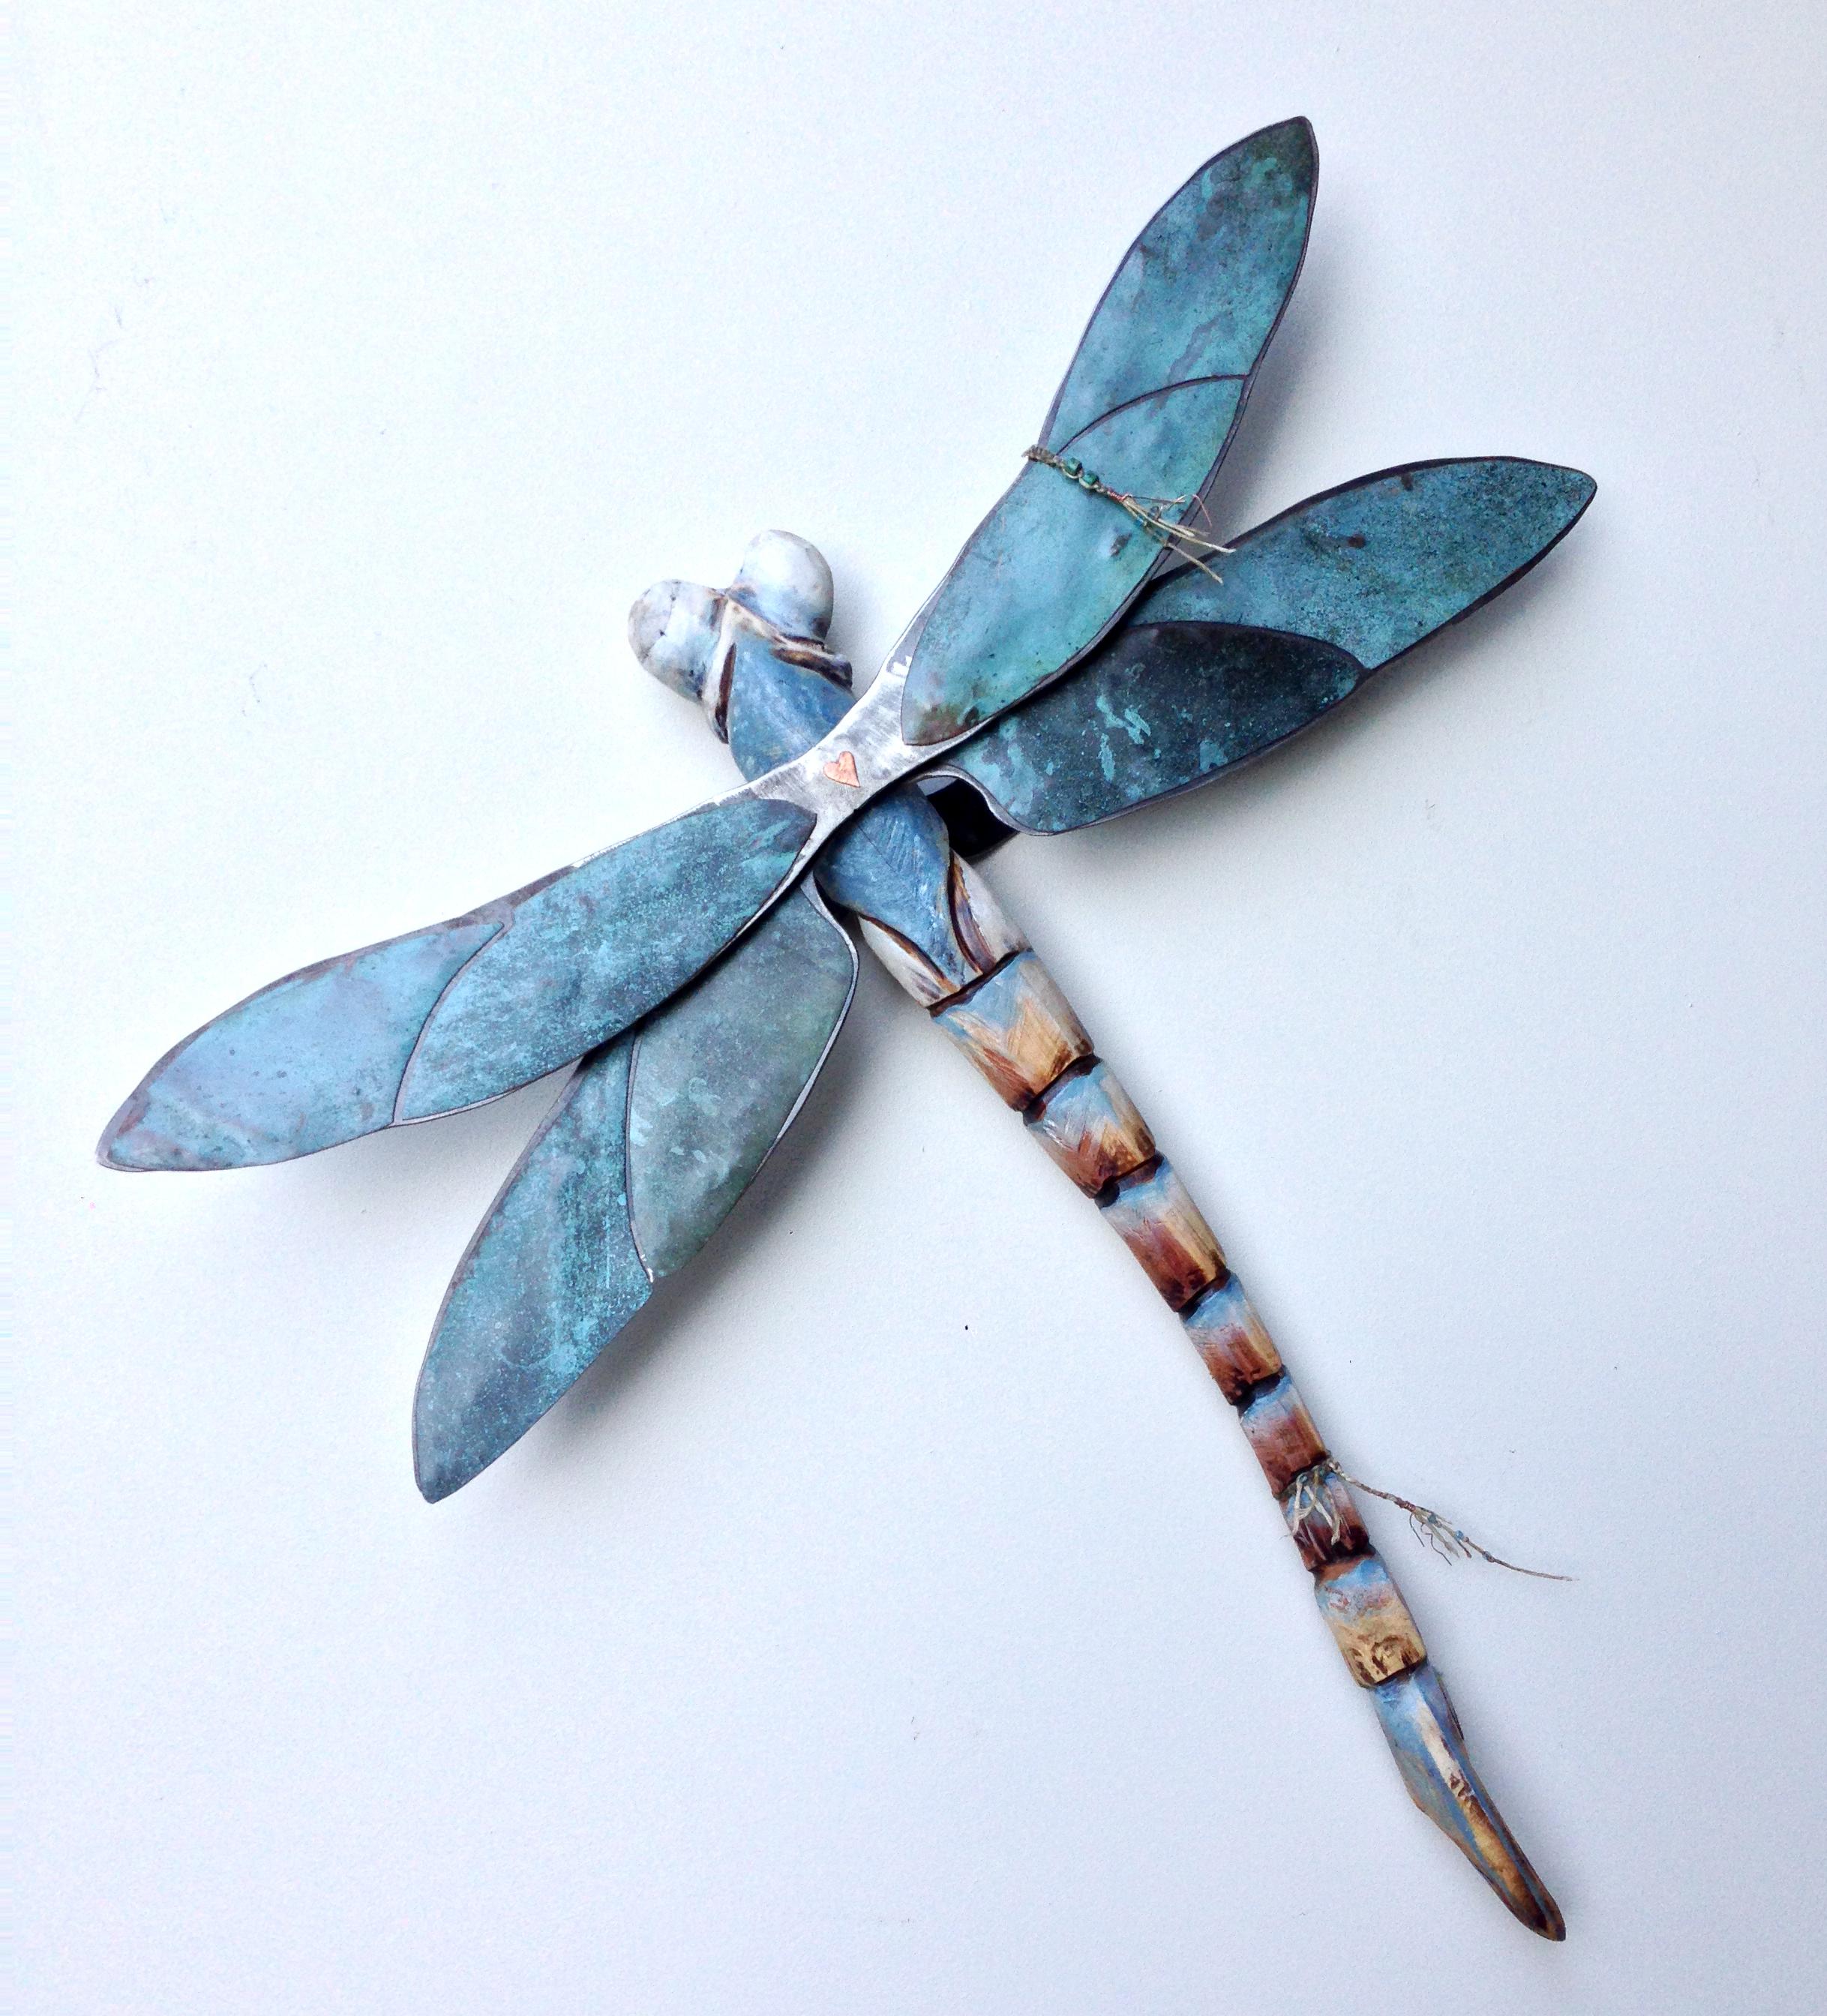 dragonfly patina 2016.jpg